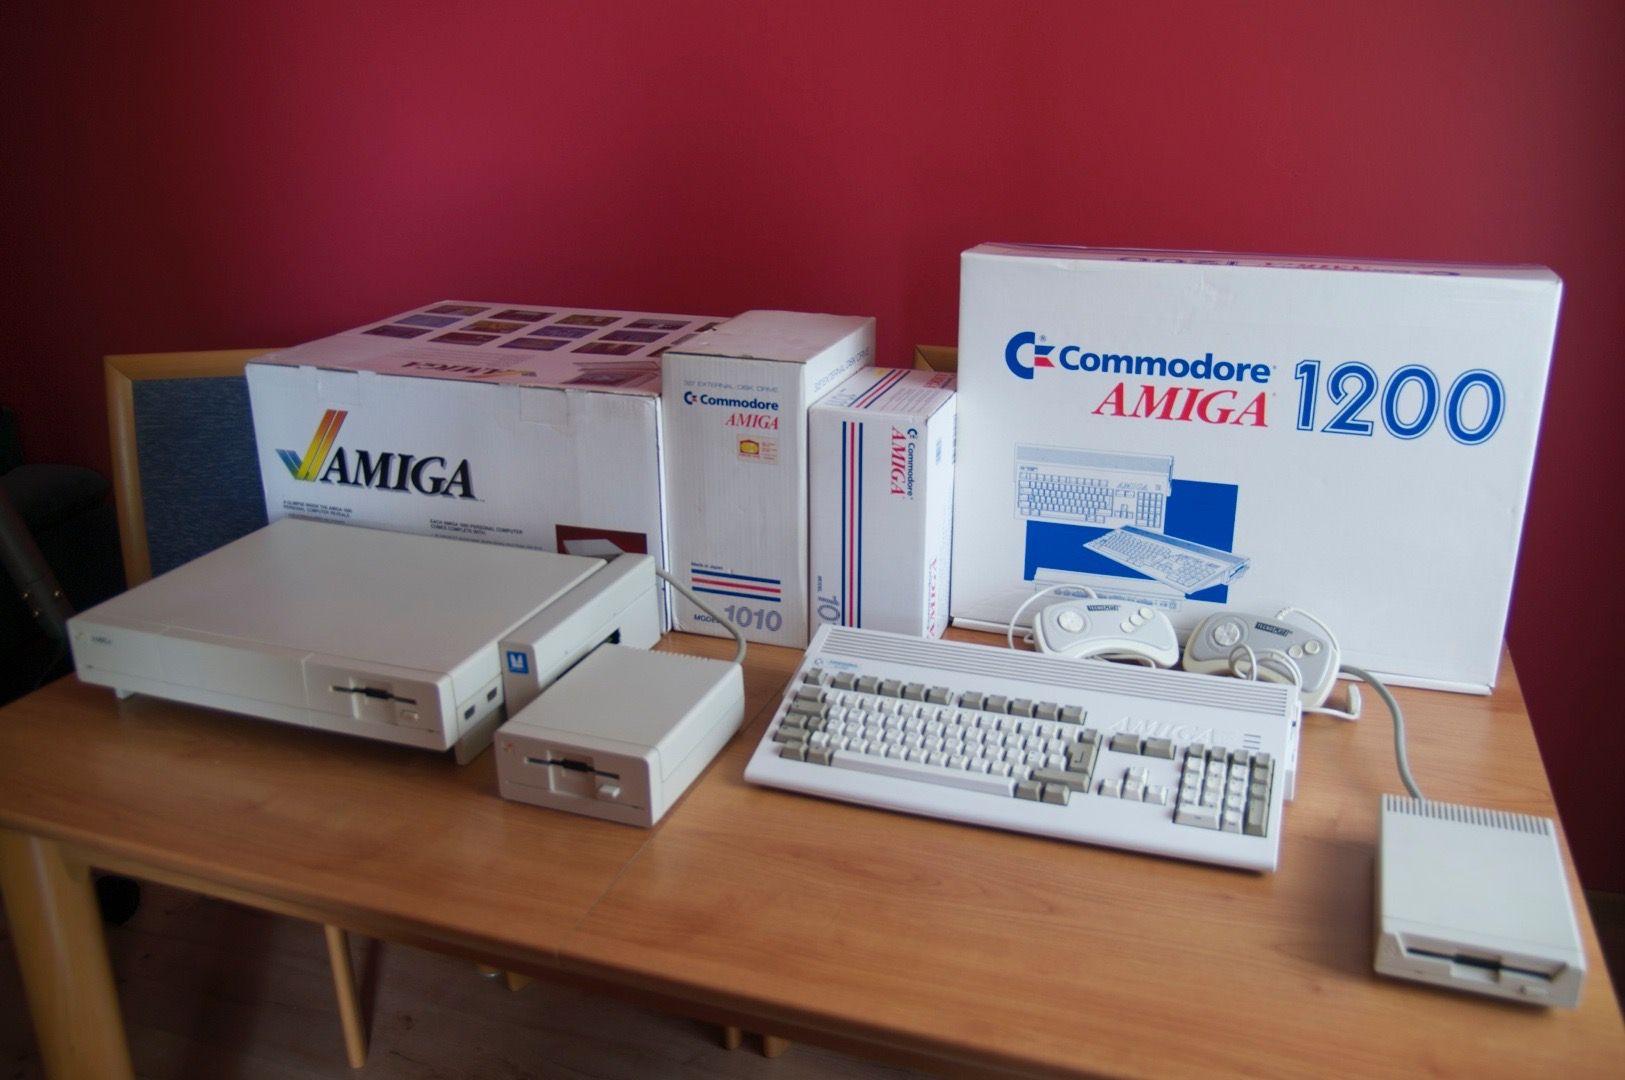 Commodore Amiga | Commodore & Amiga in 2019 | Gaming